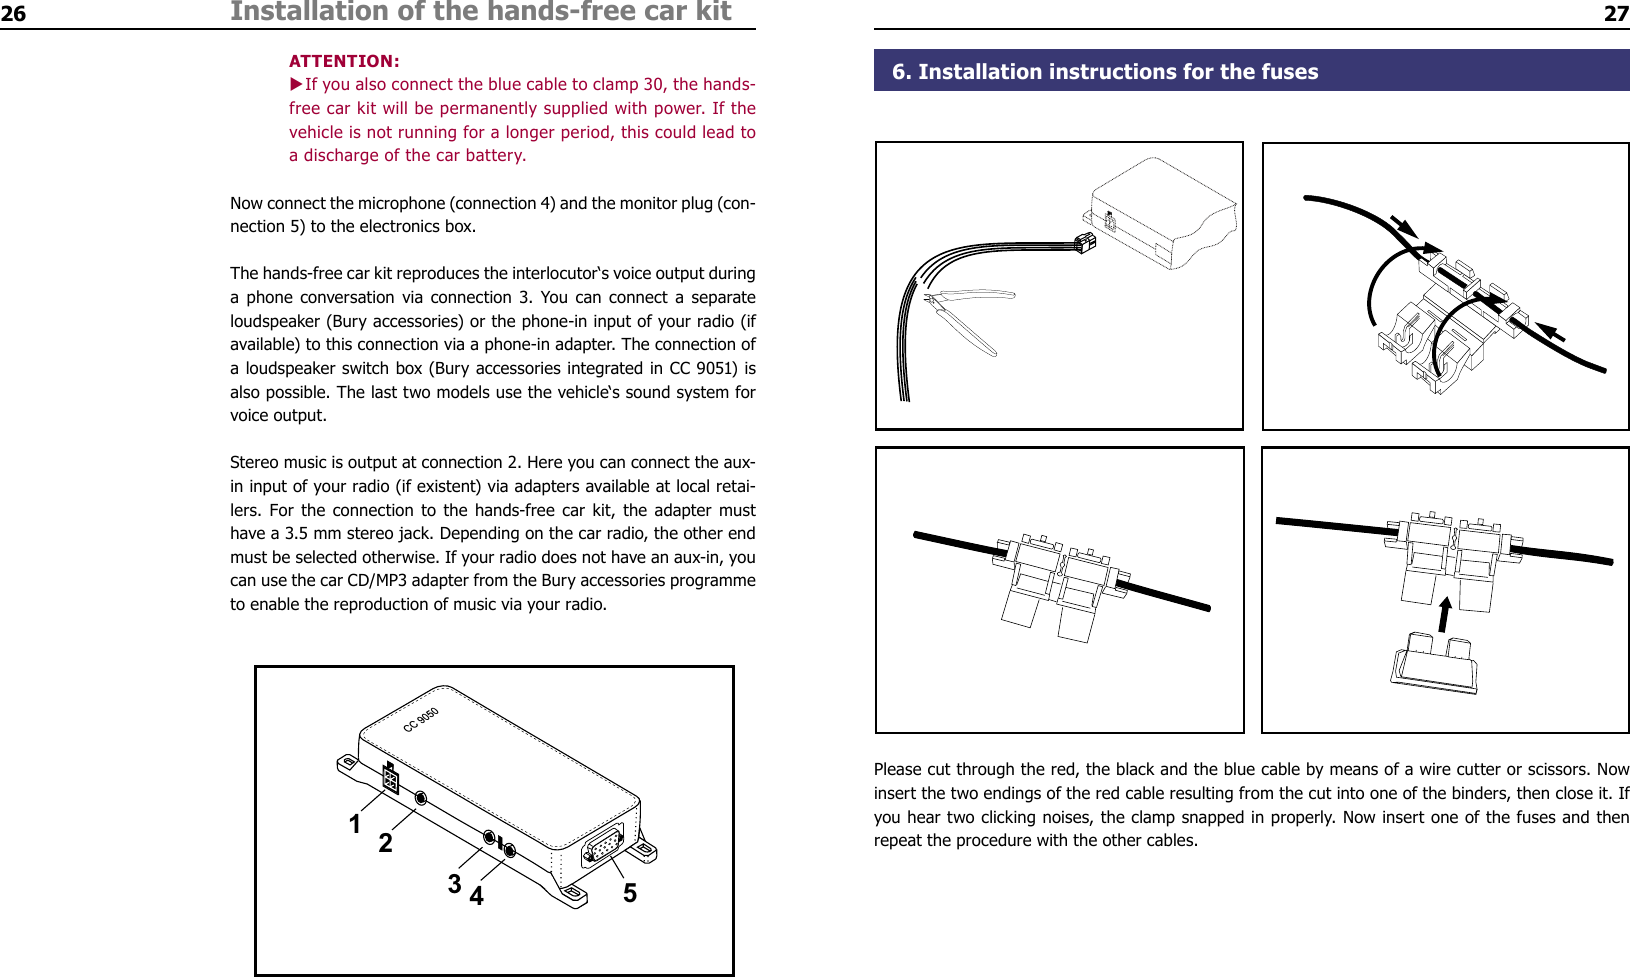 Bury Car Kit Wiring Diagram Free Download Amp And Co Kg Cc9040 51 Bluetooth Handsfree Carkit User Manual At